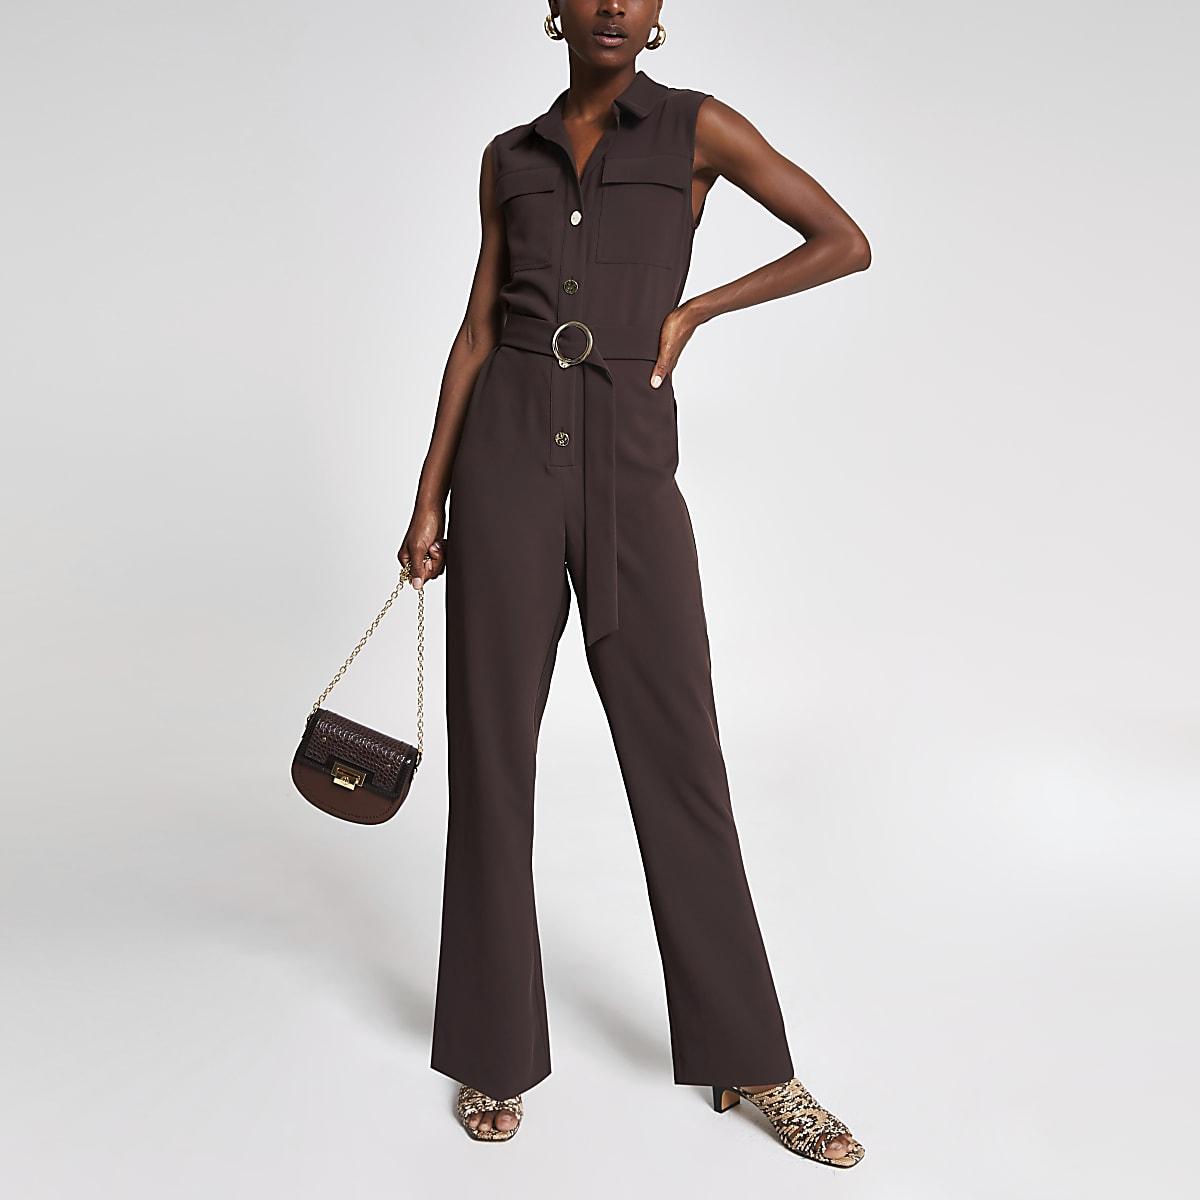 Dark brown utility boiler suit